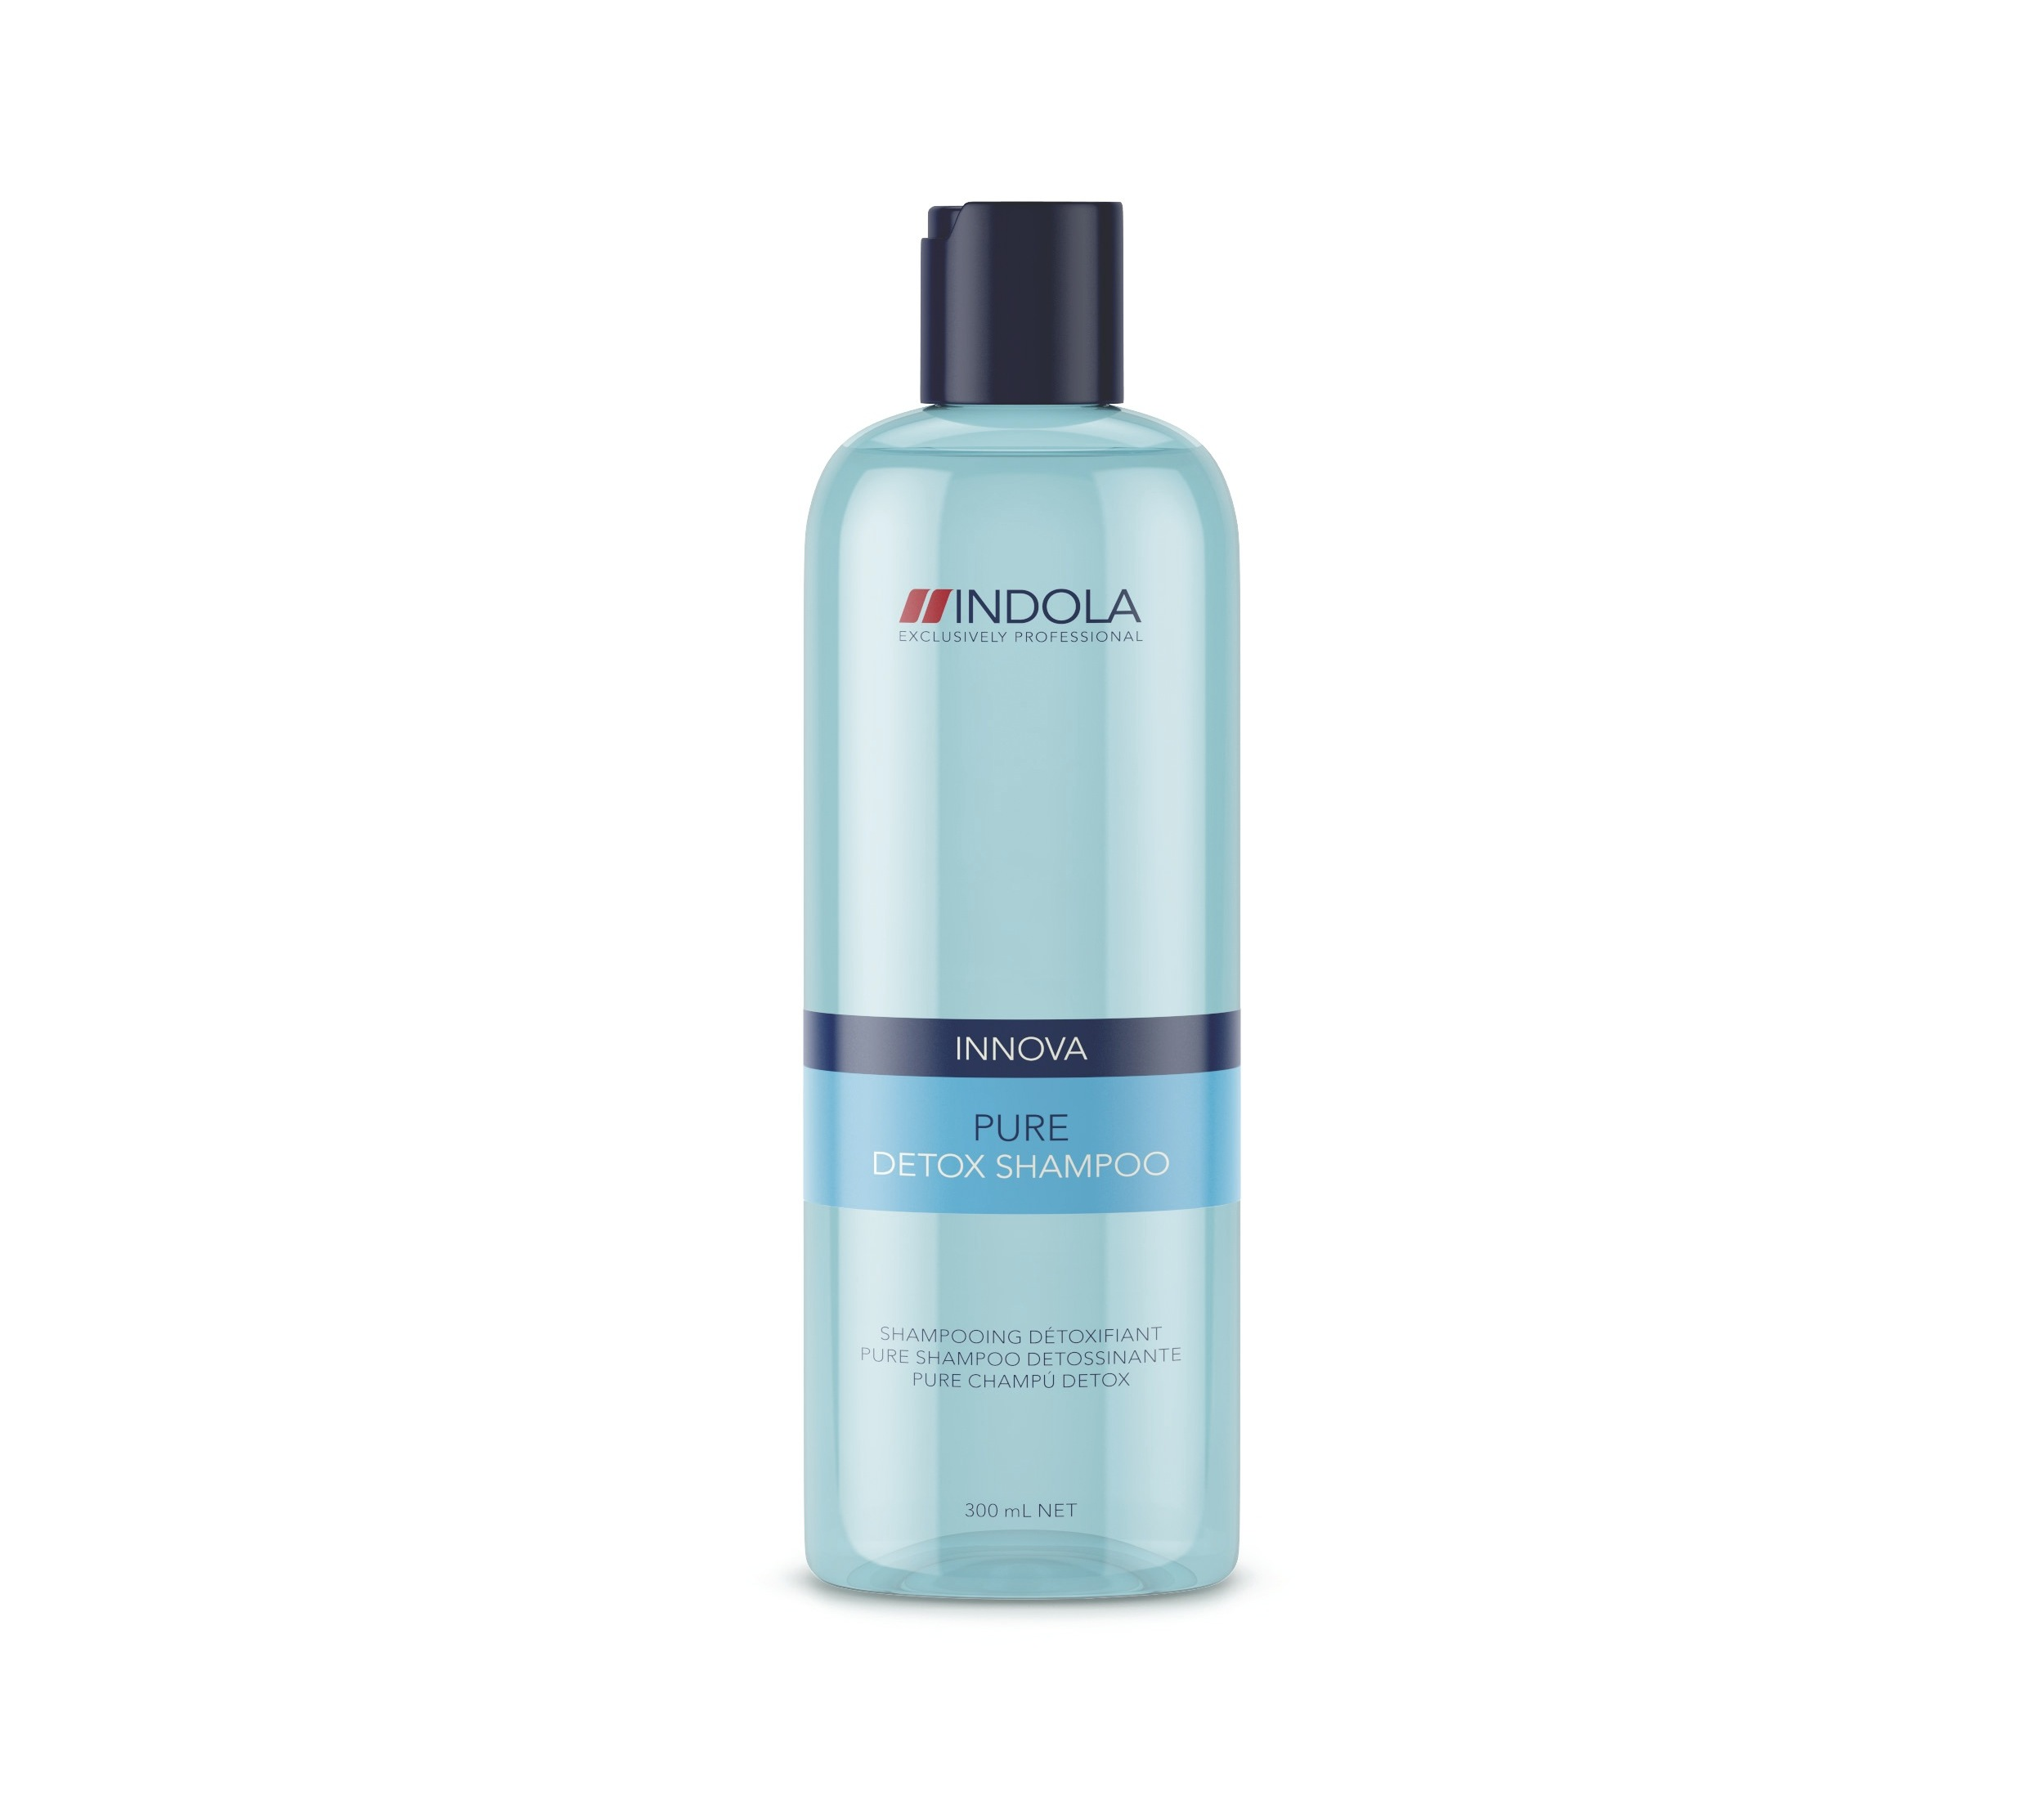 Indola Pure Shampoo 300ml